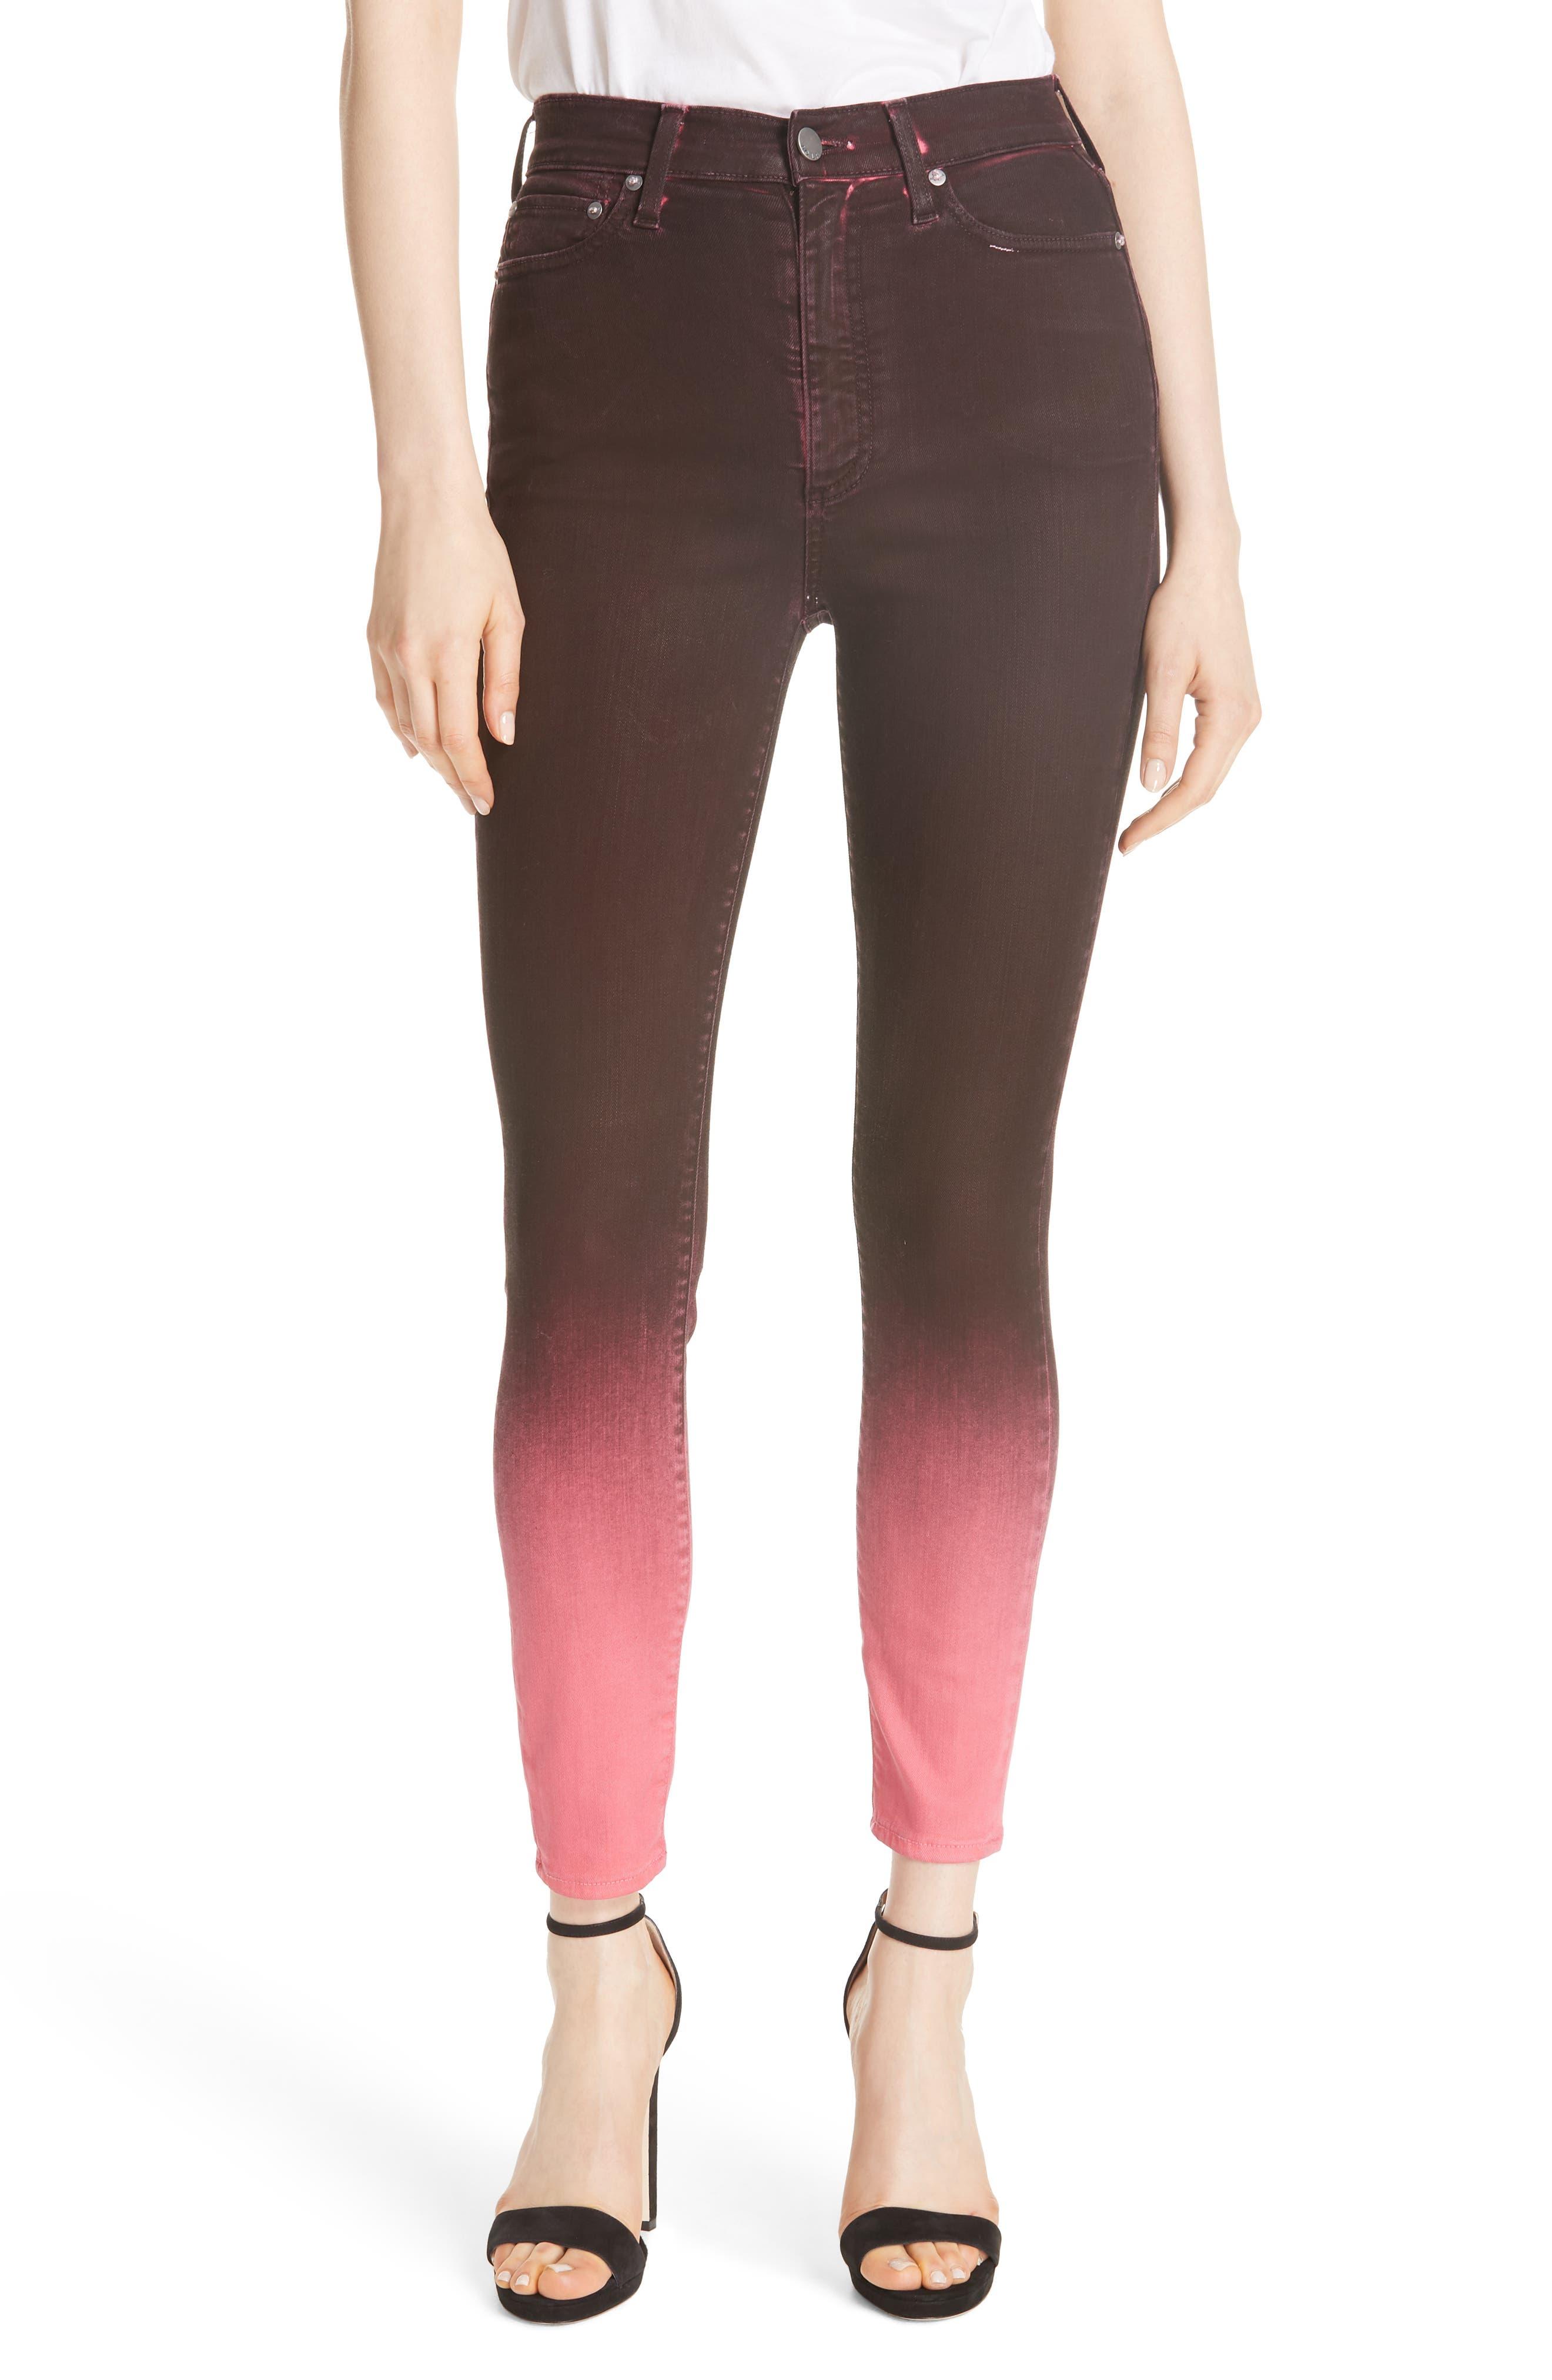 AO.LA Good High Waist Ankle Skinny Jeans,                             Main thumbnail 1, color,                             WINE/ BUBBLEGUM